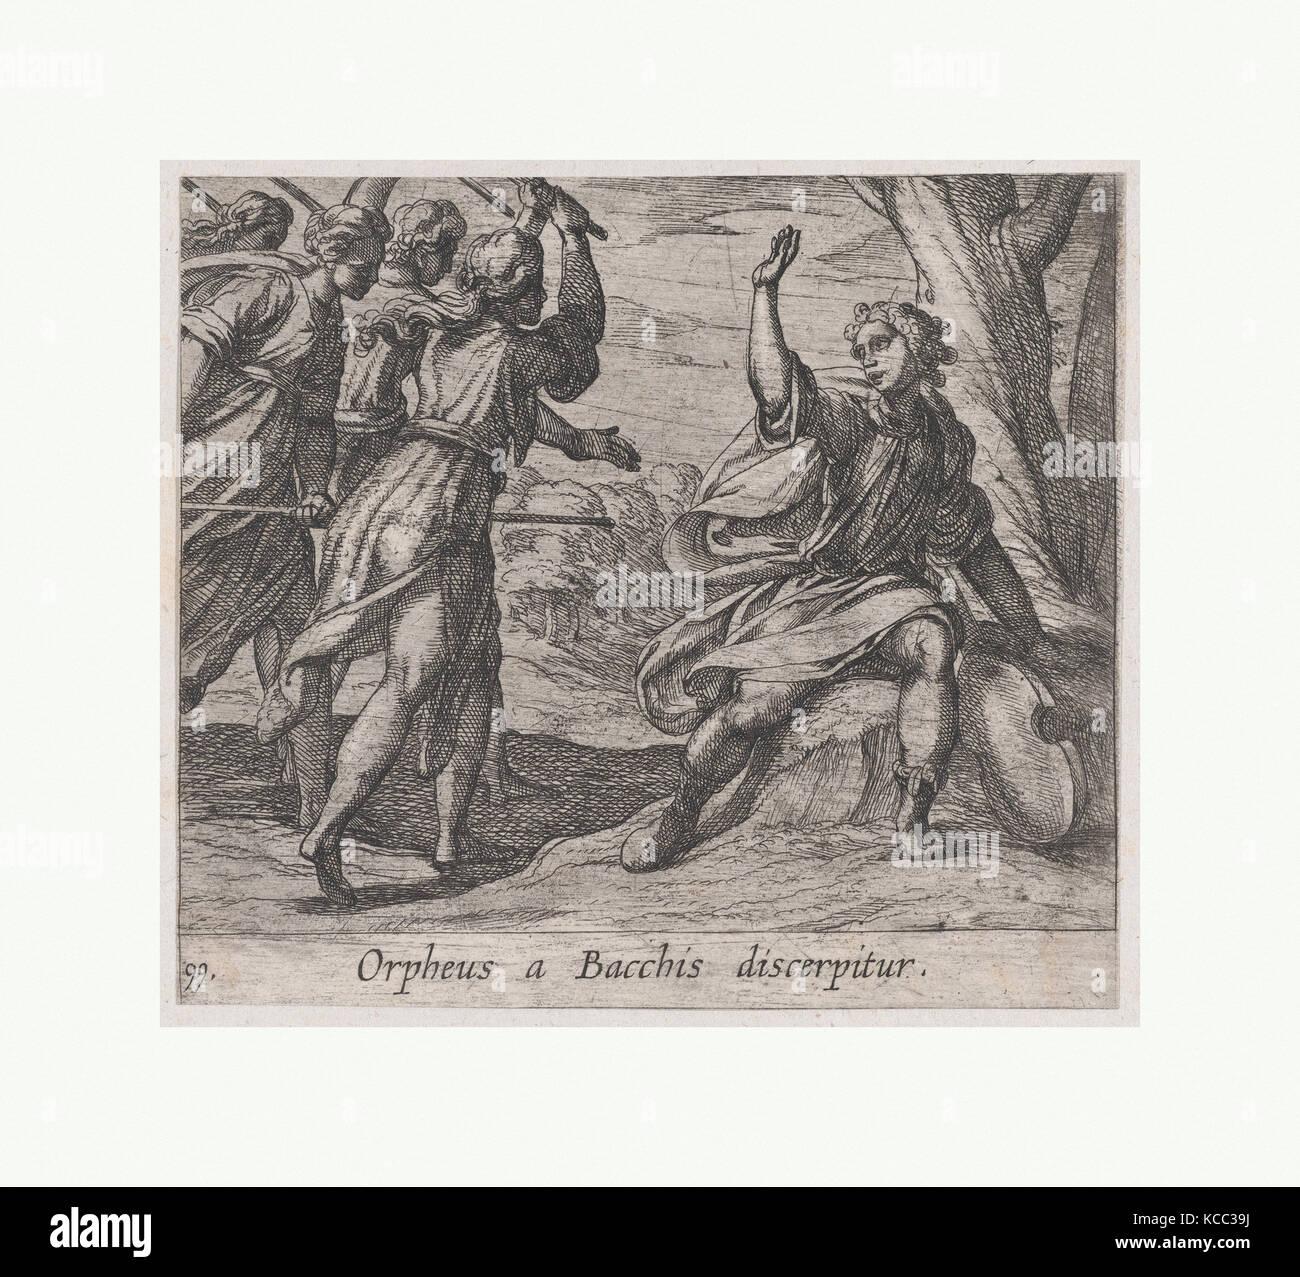 La morte d'Orfeo